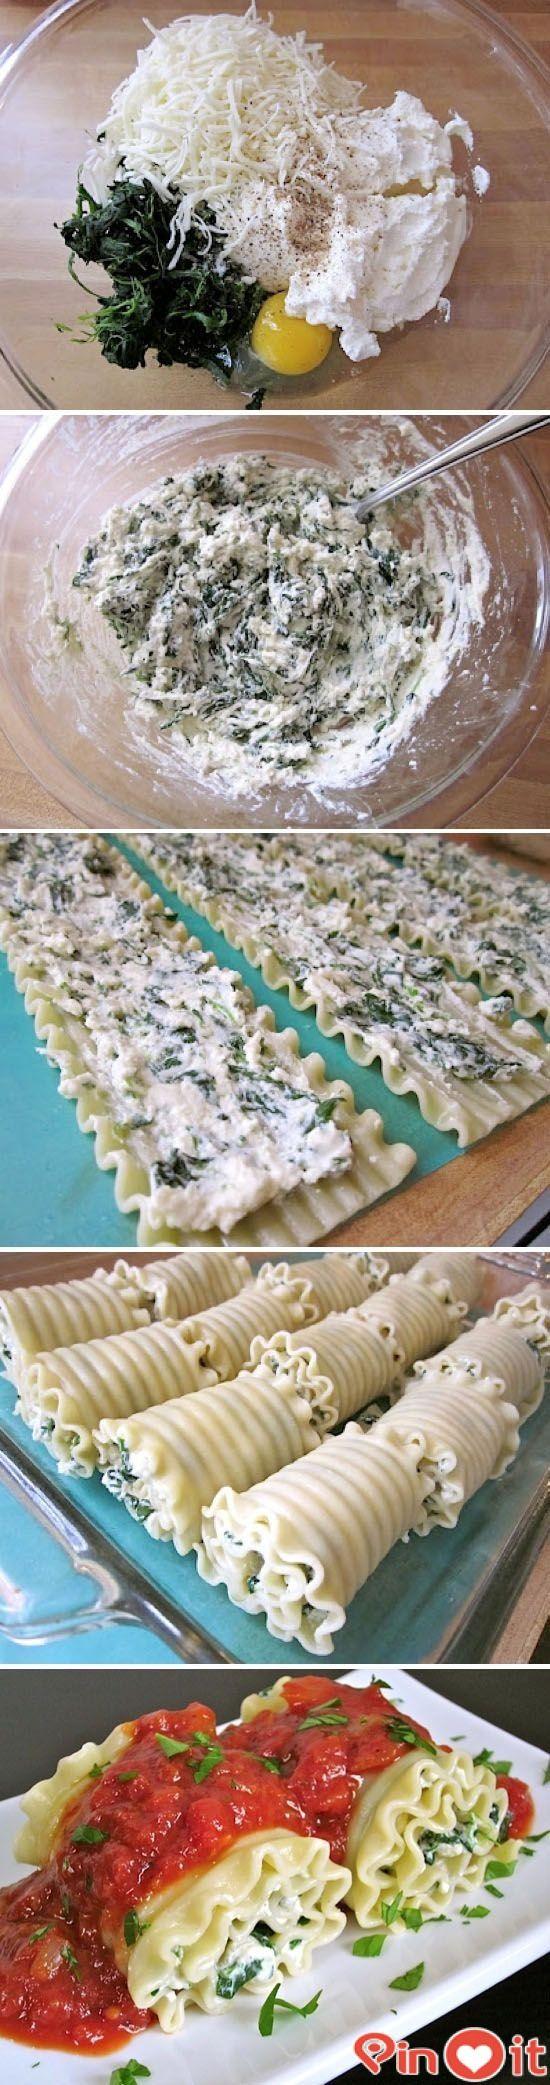 FASHİON TV 2015: Spinach lasagna roll ups